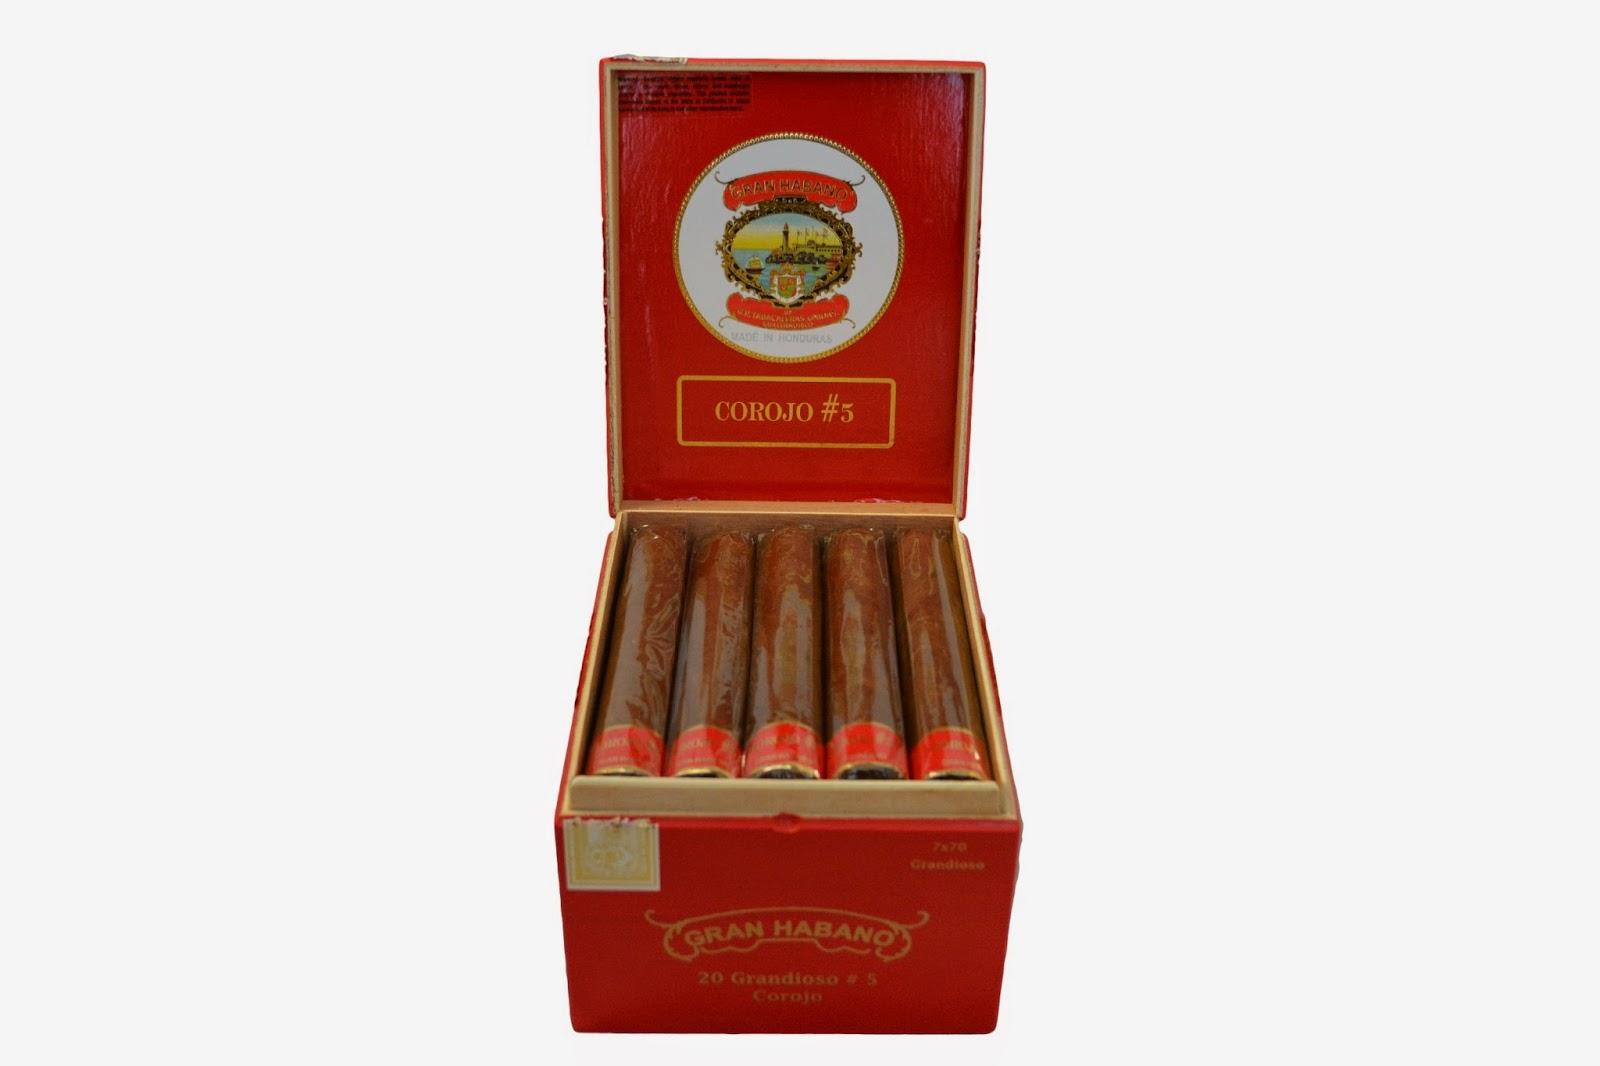 Cigar News: Gran Habano Corojo #5 Grandioso